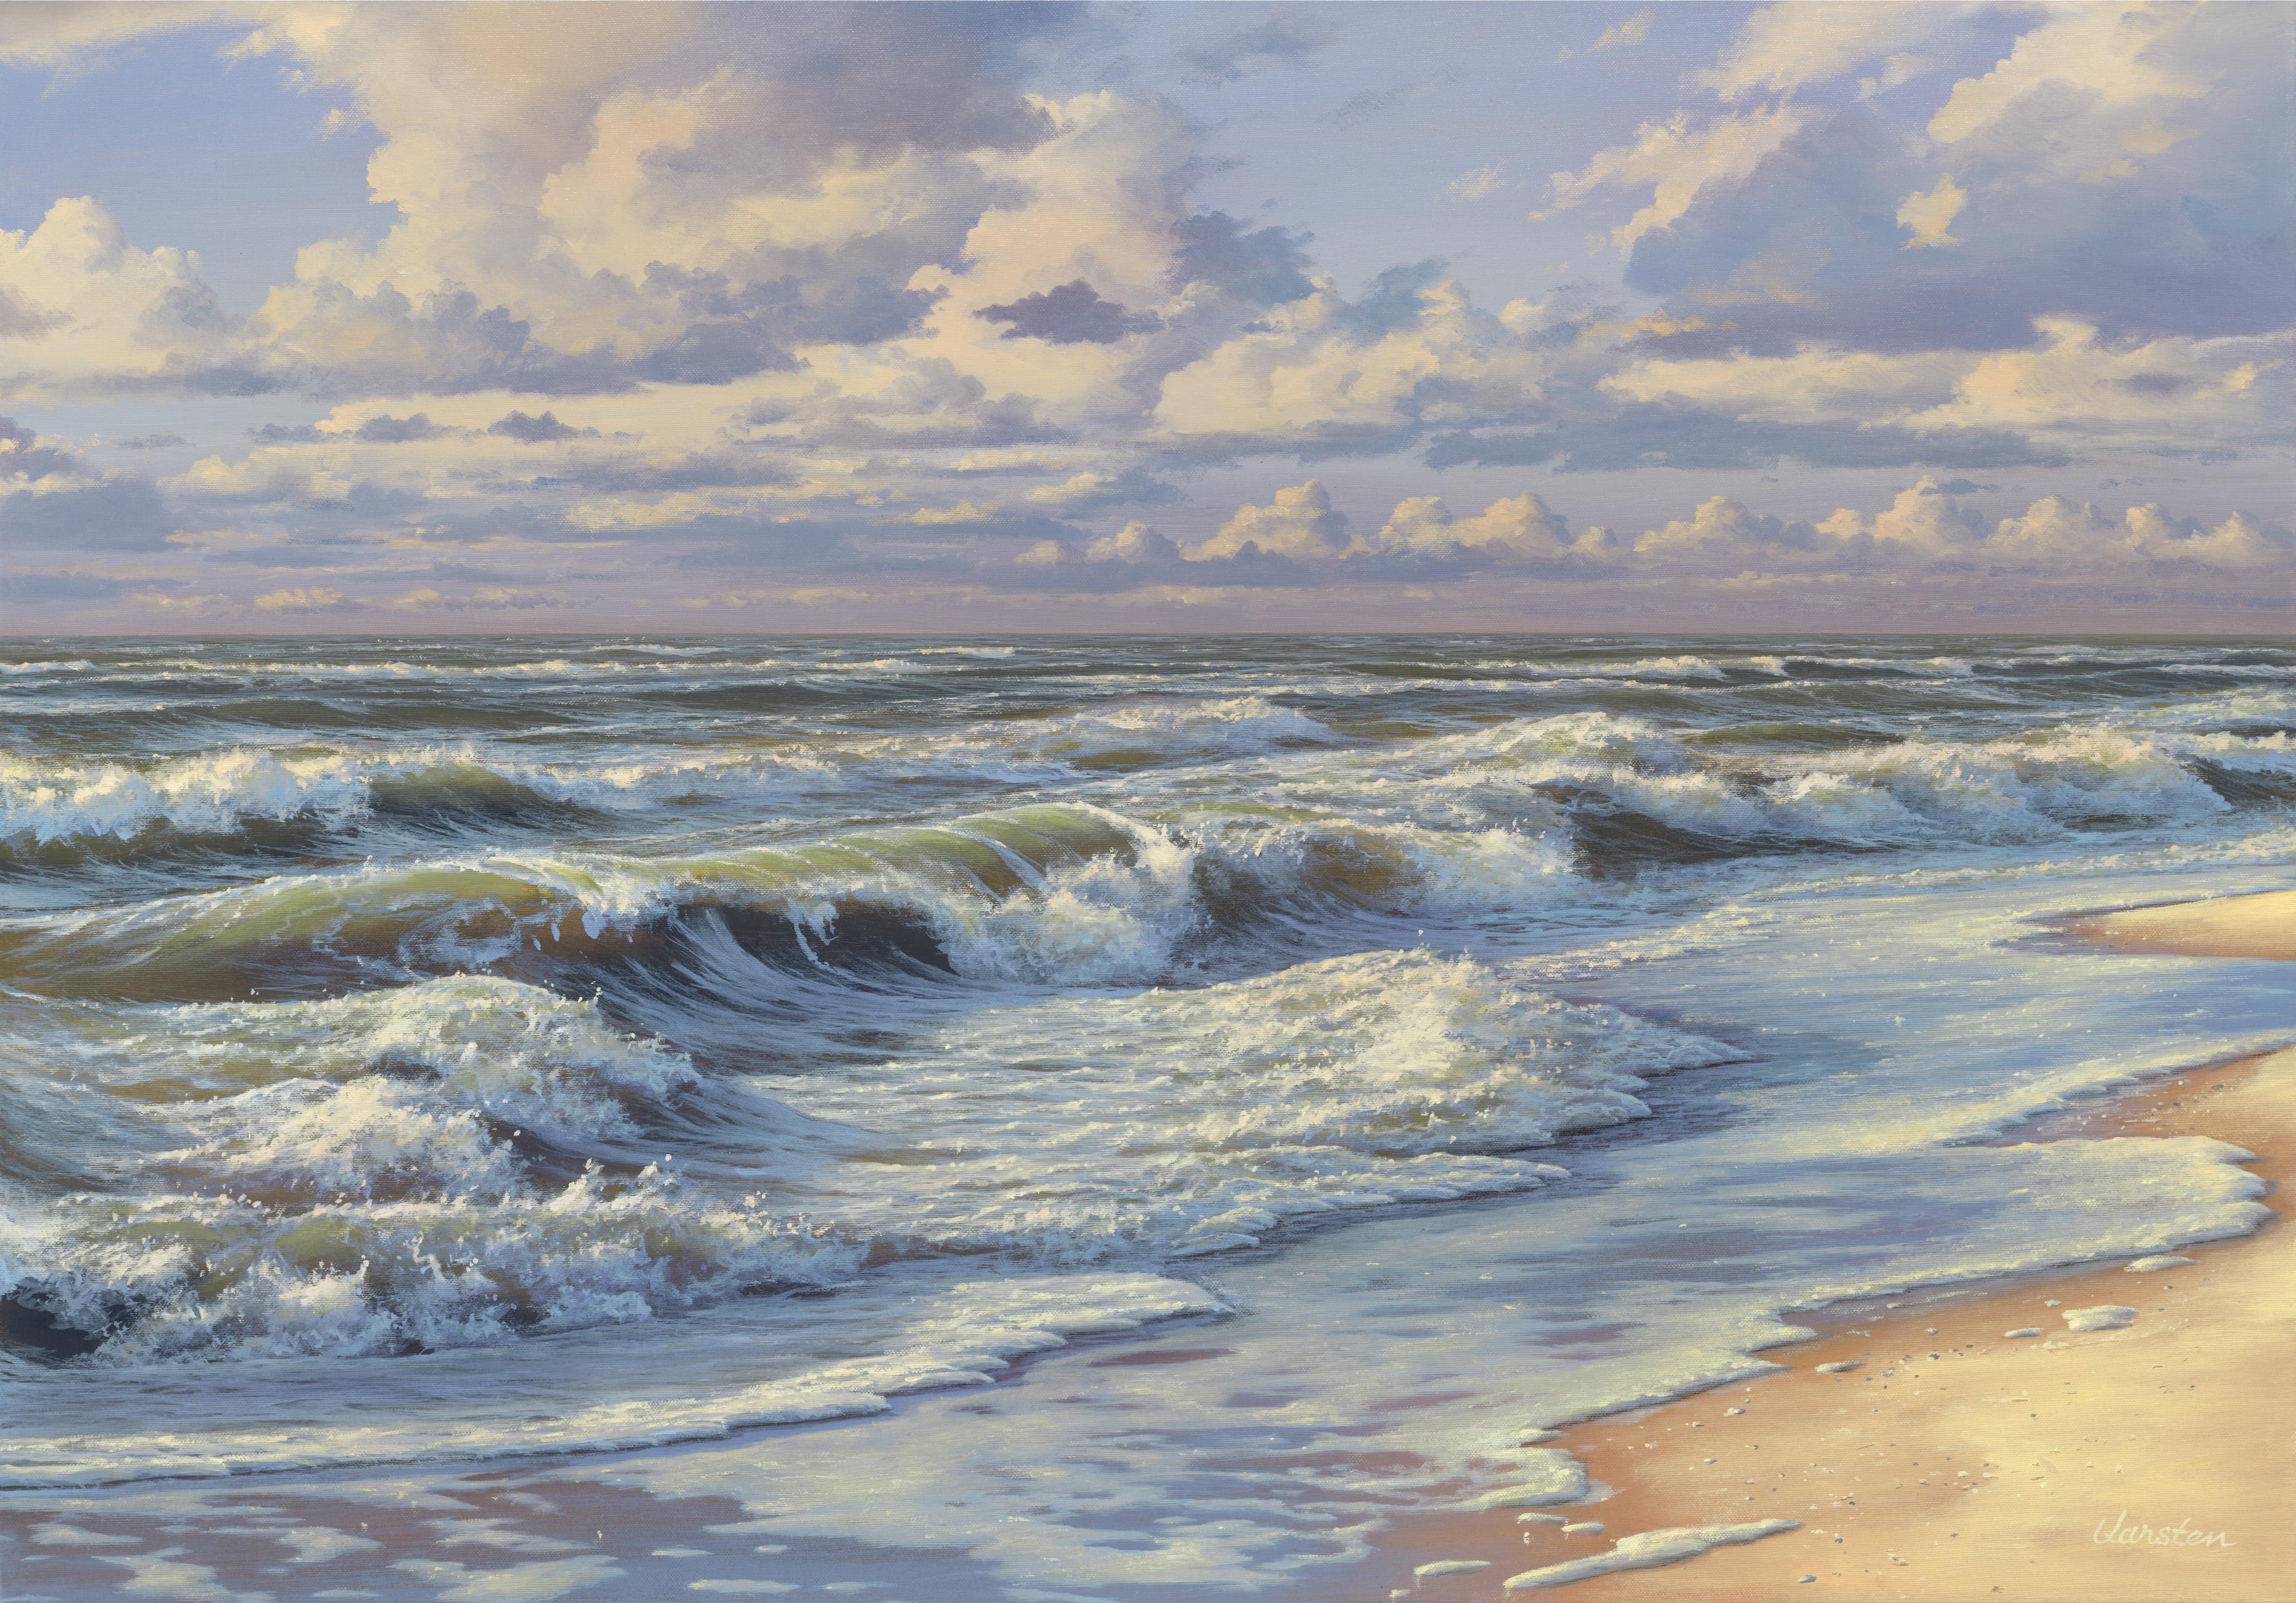 Das Rauschen des Meeres - Fin Art Print